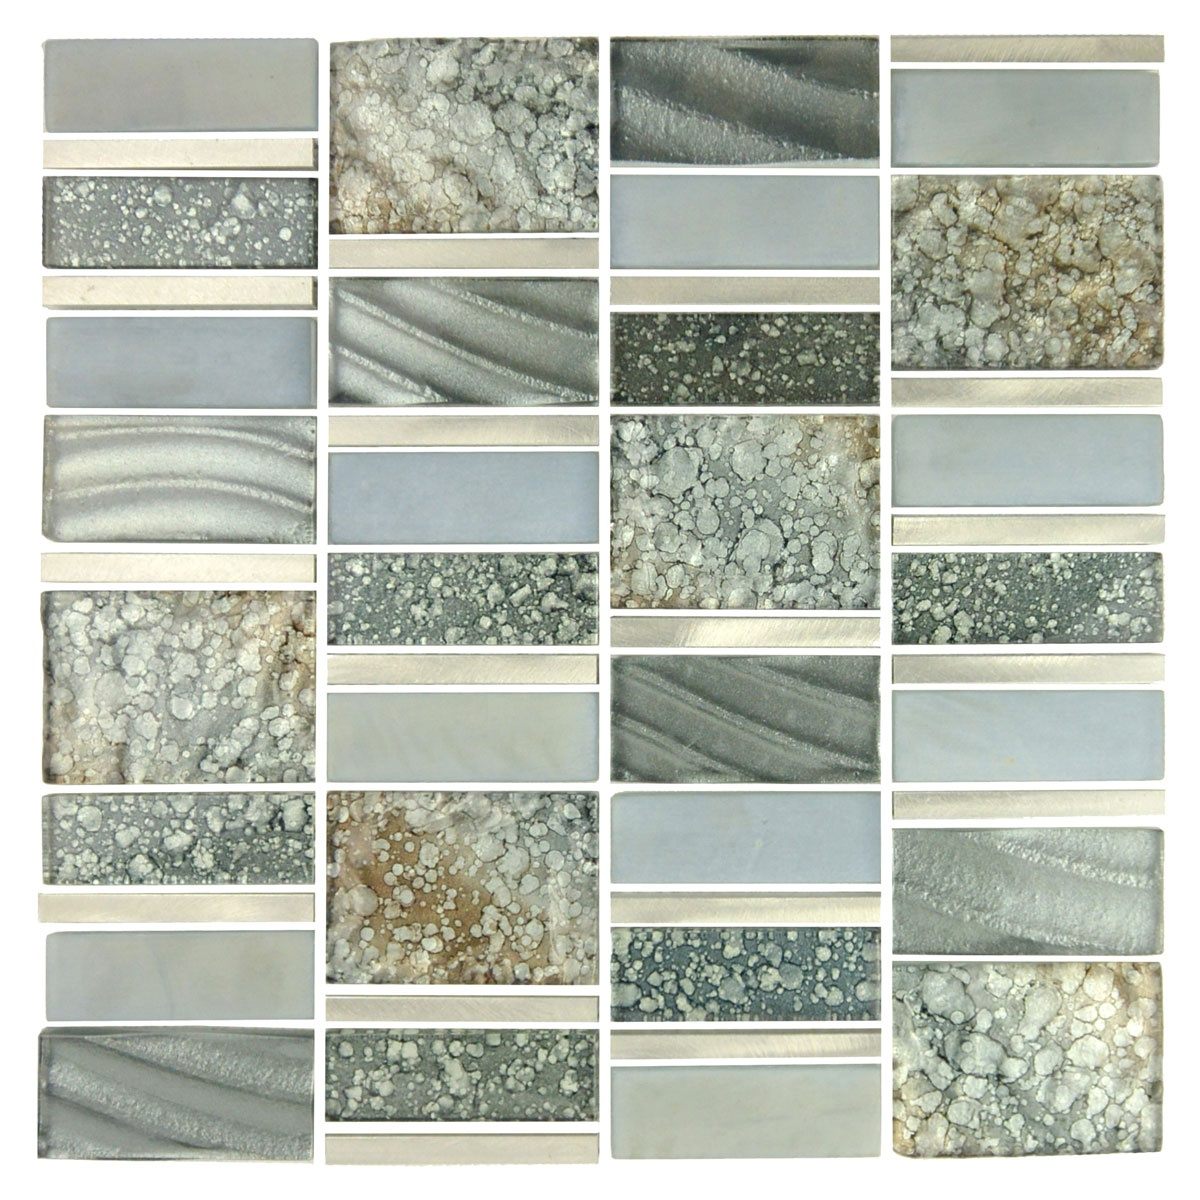 Abolos- Imperial Random Sized Glass and Aluminum Kitchen Wall, Bathroom Backsplash Mosaic Tile in Silver Sea (5sqft, 5pc Box)